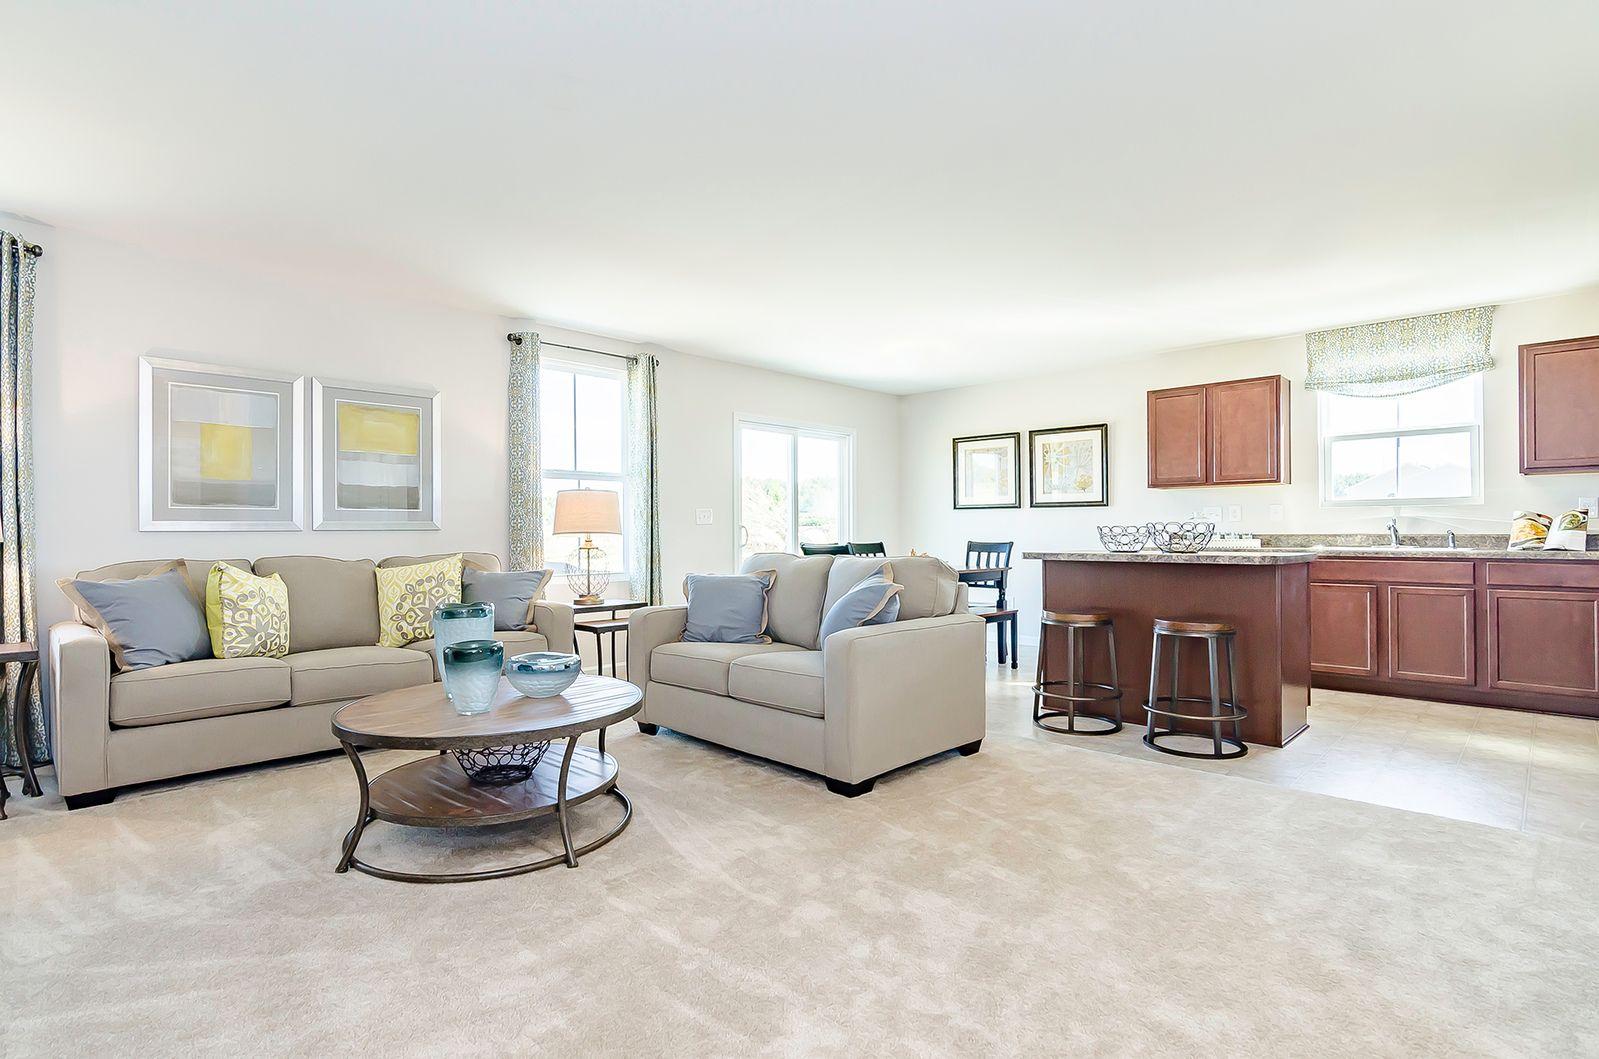 Ryan Homes, Stonecrest, Plan 1296-1316686, Martinsburg, WV - New ...